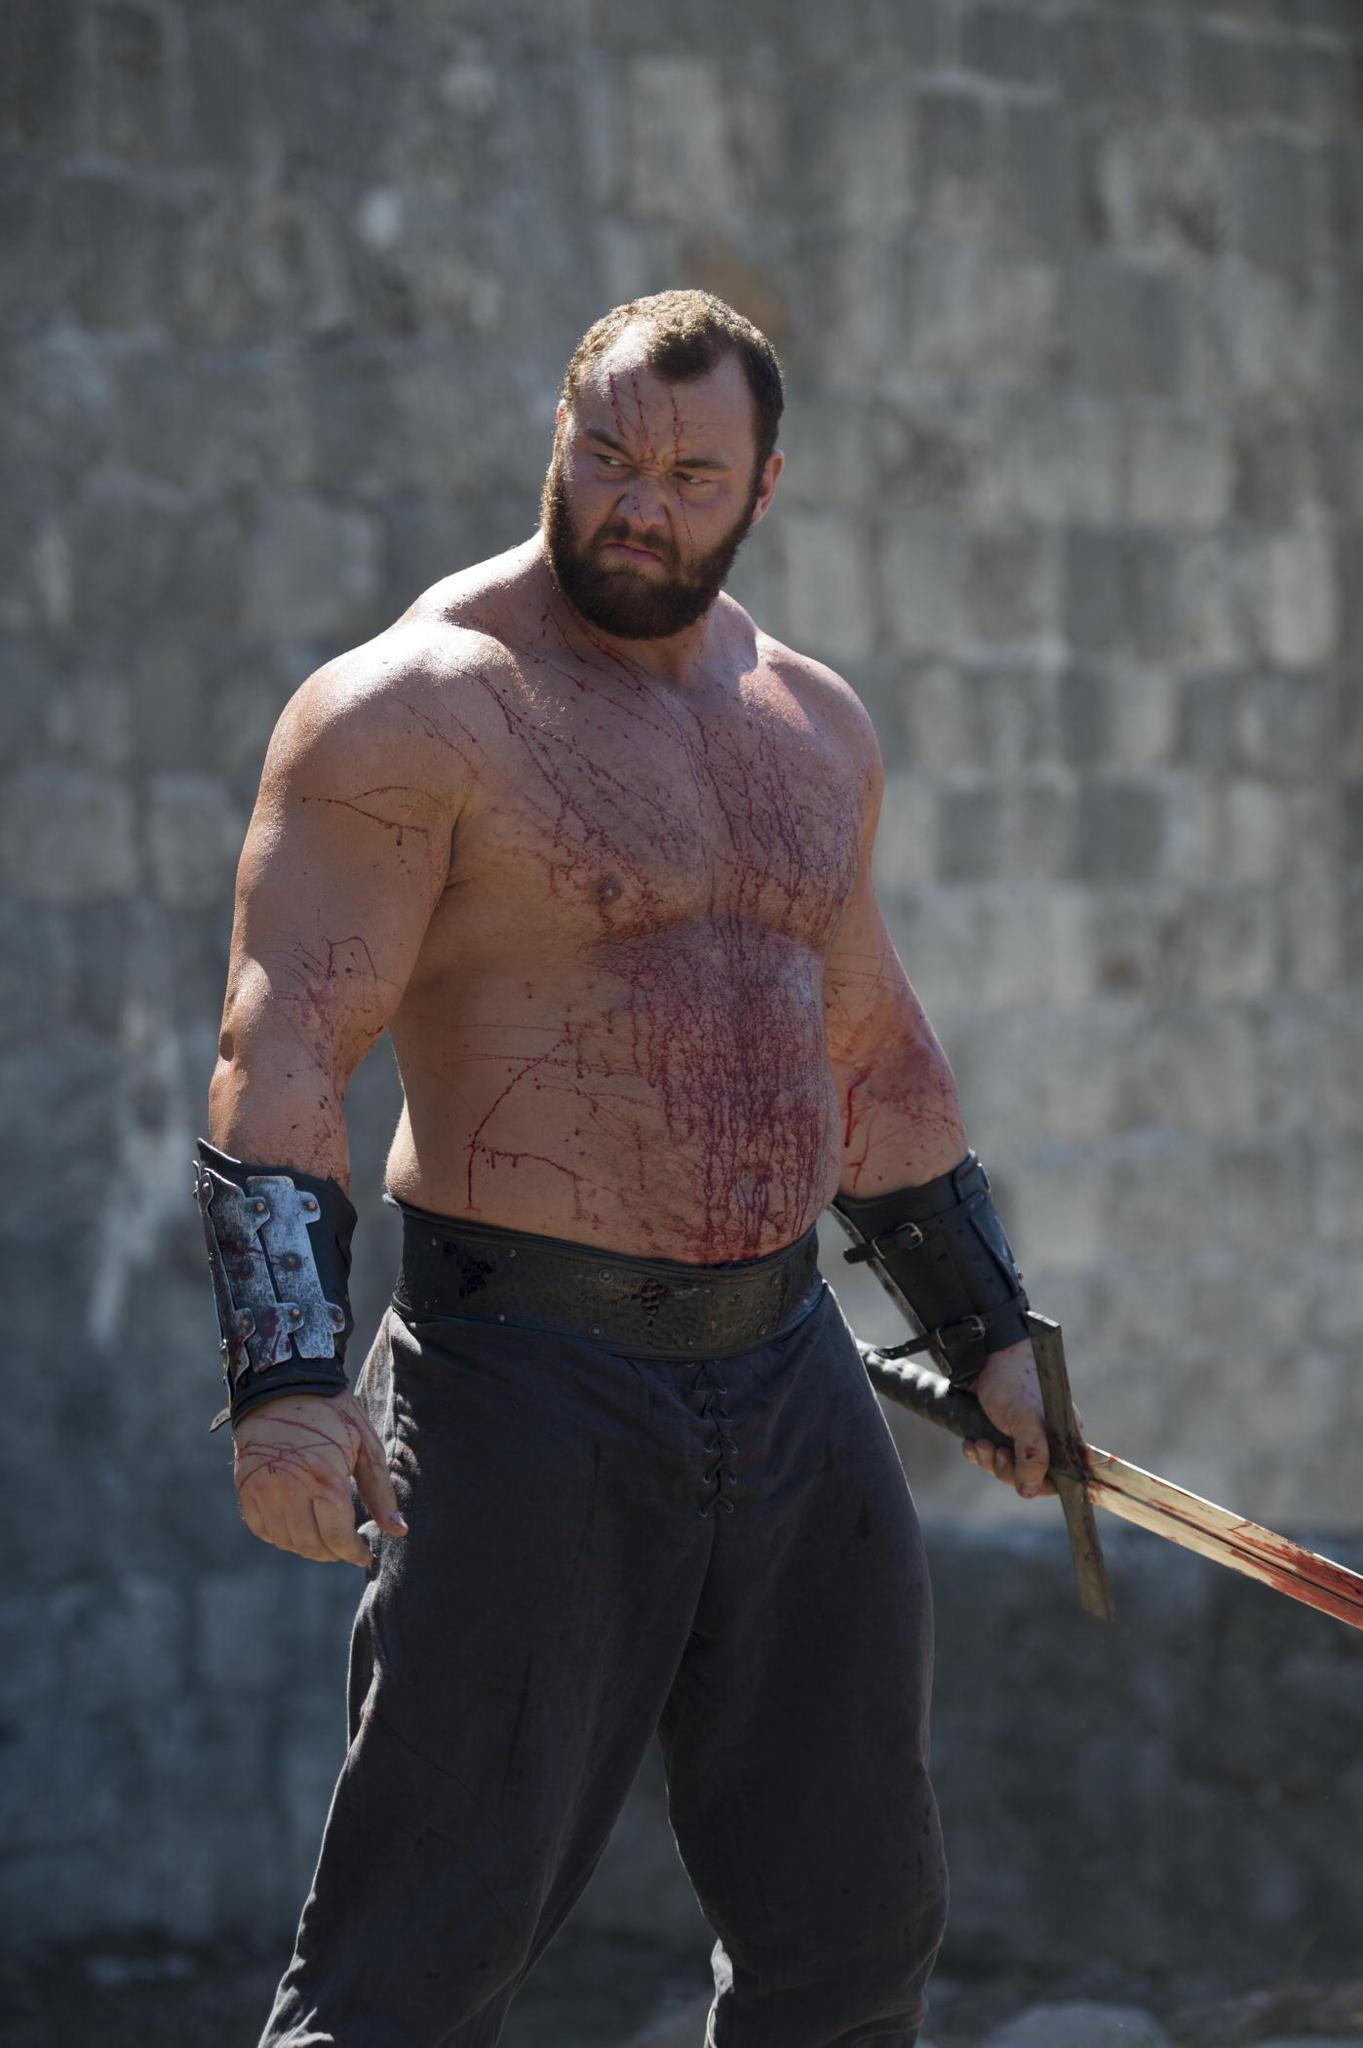 Il trono di spade: Hafþór Júlíus Björnsson nell'episodio Mockingbird